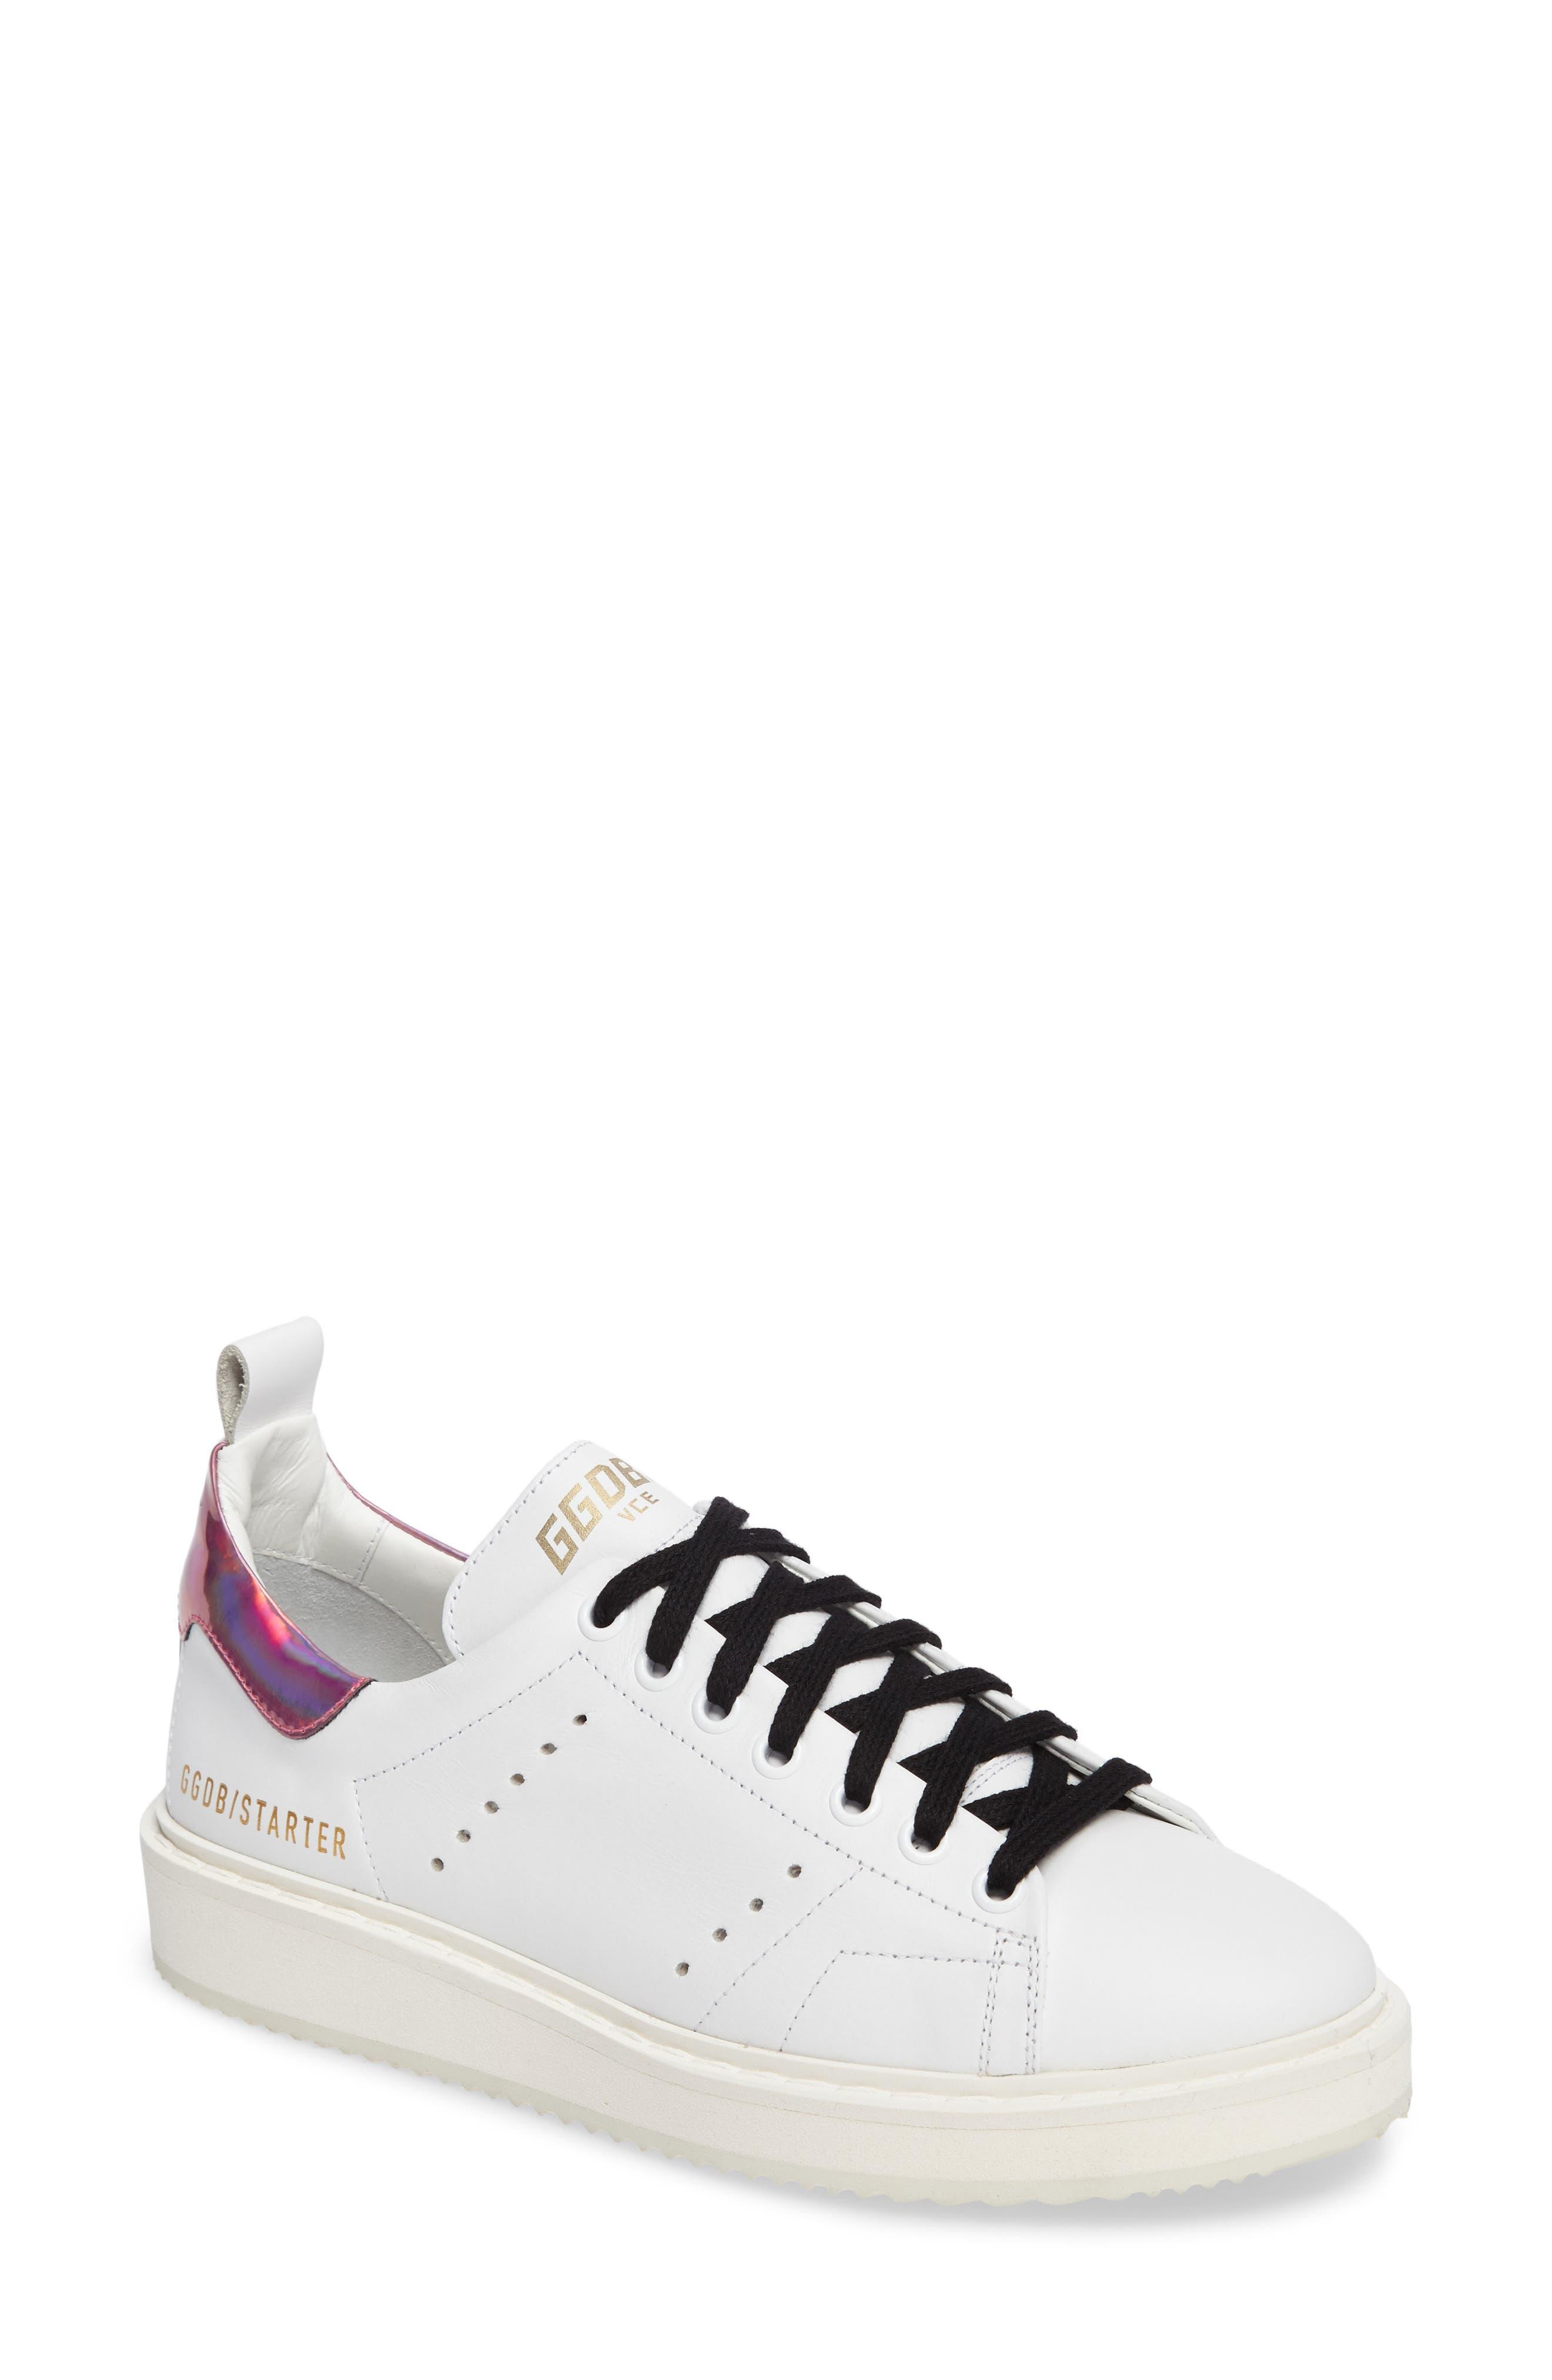 Starter Low Top Sneaker,                         Main,                         color, 100